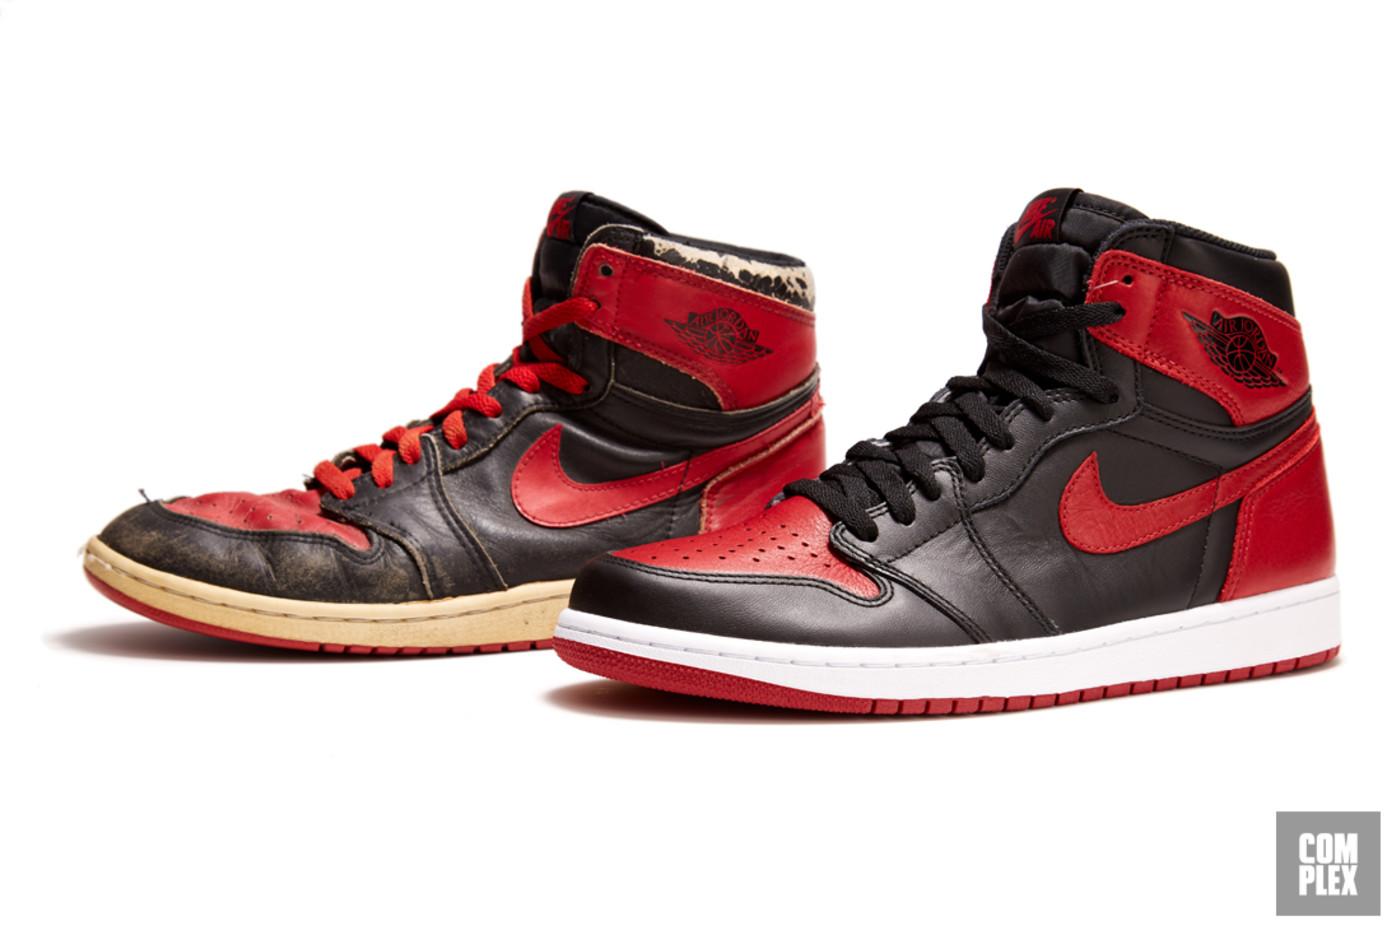 Atar Ministro Álbum de graduación  23 Things You May Not Know About Air Jordans | Complex